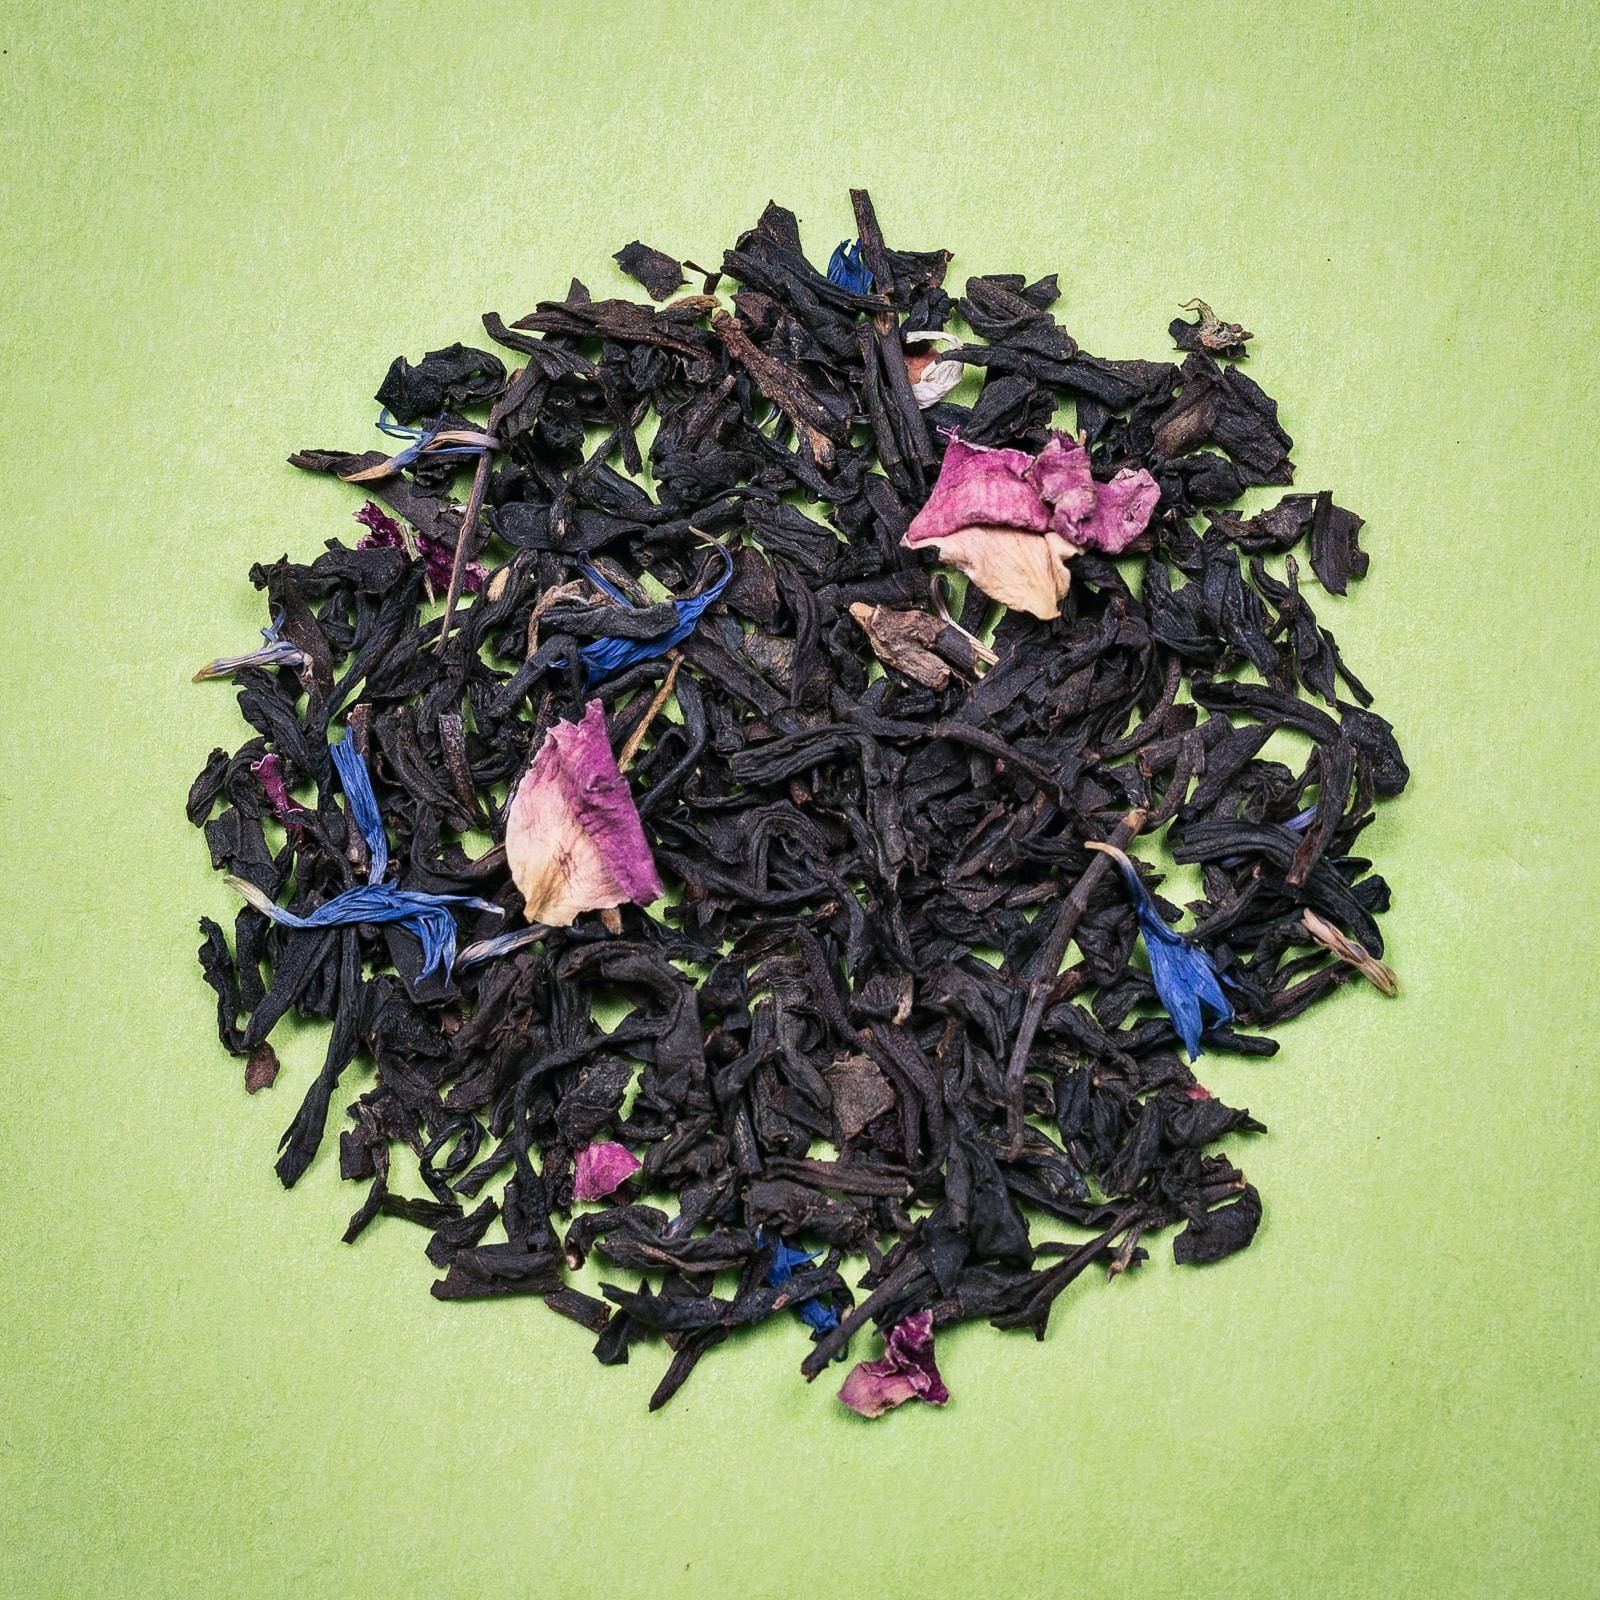 Anbassa-artisan-torrefacteur-the-noir-aromatise-Petit-Prince